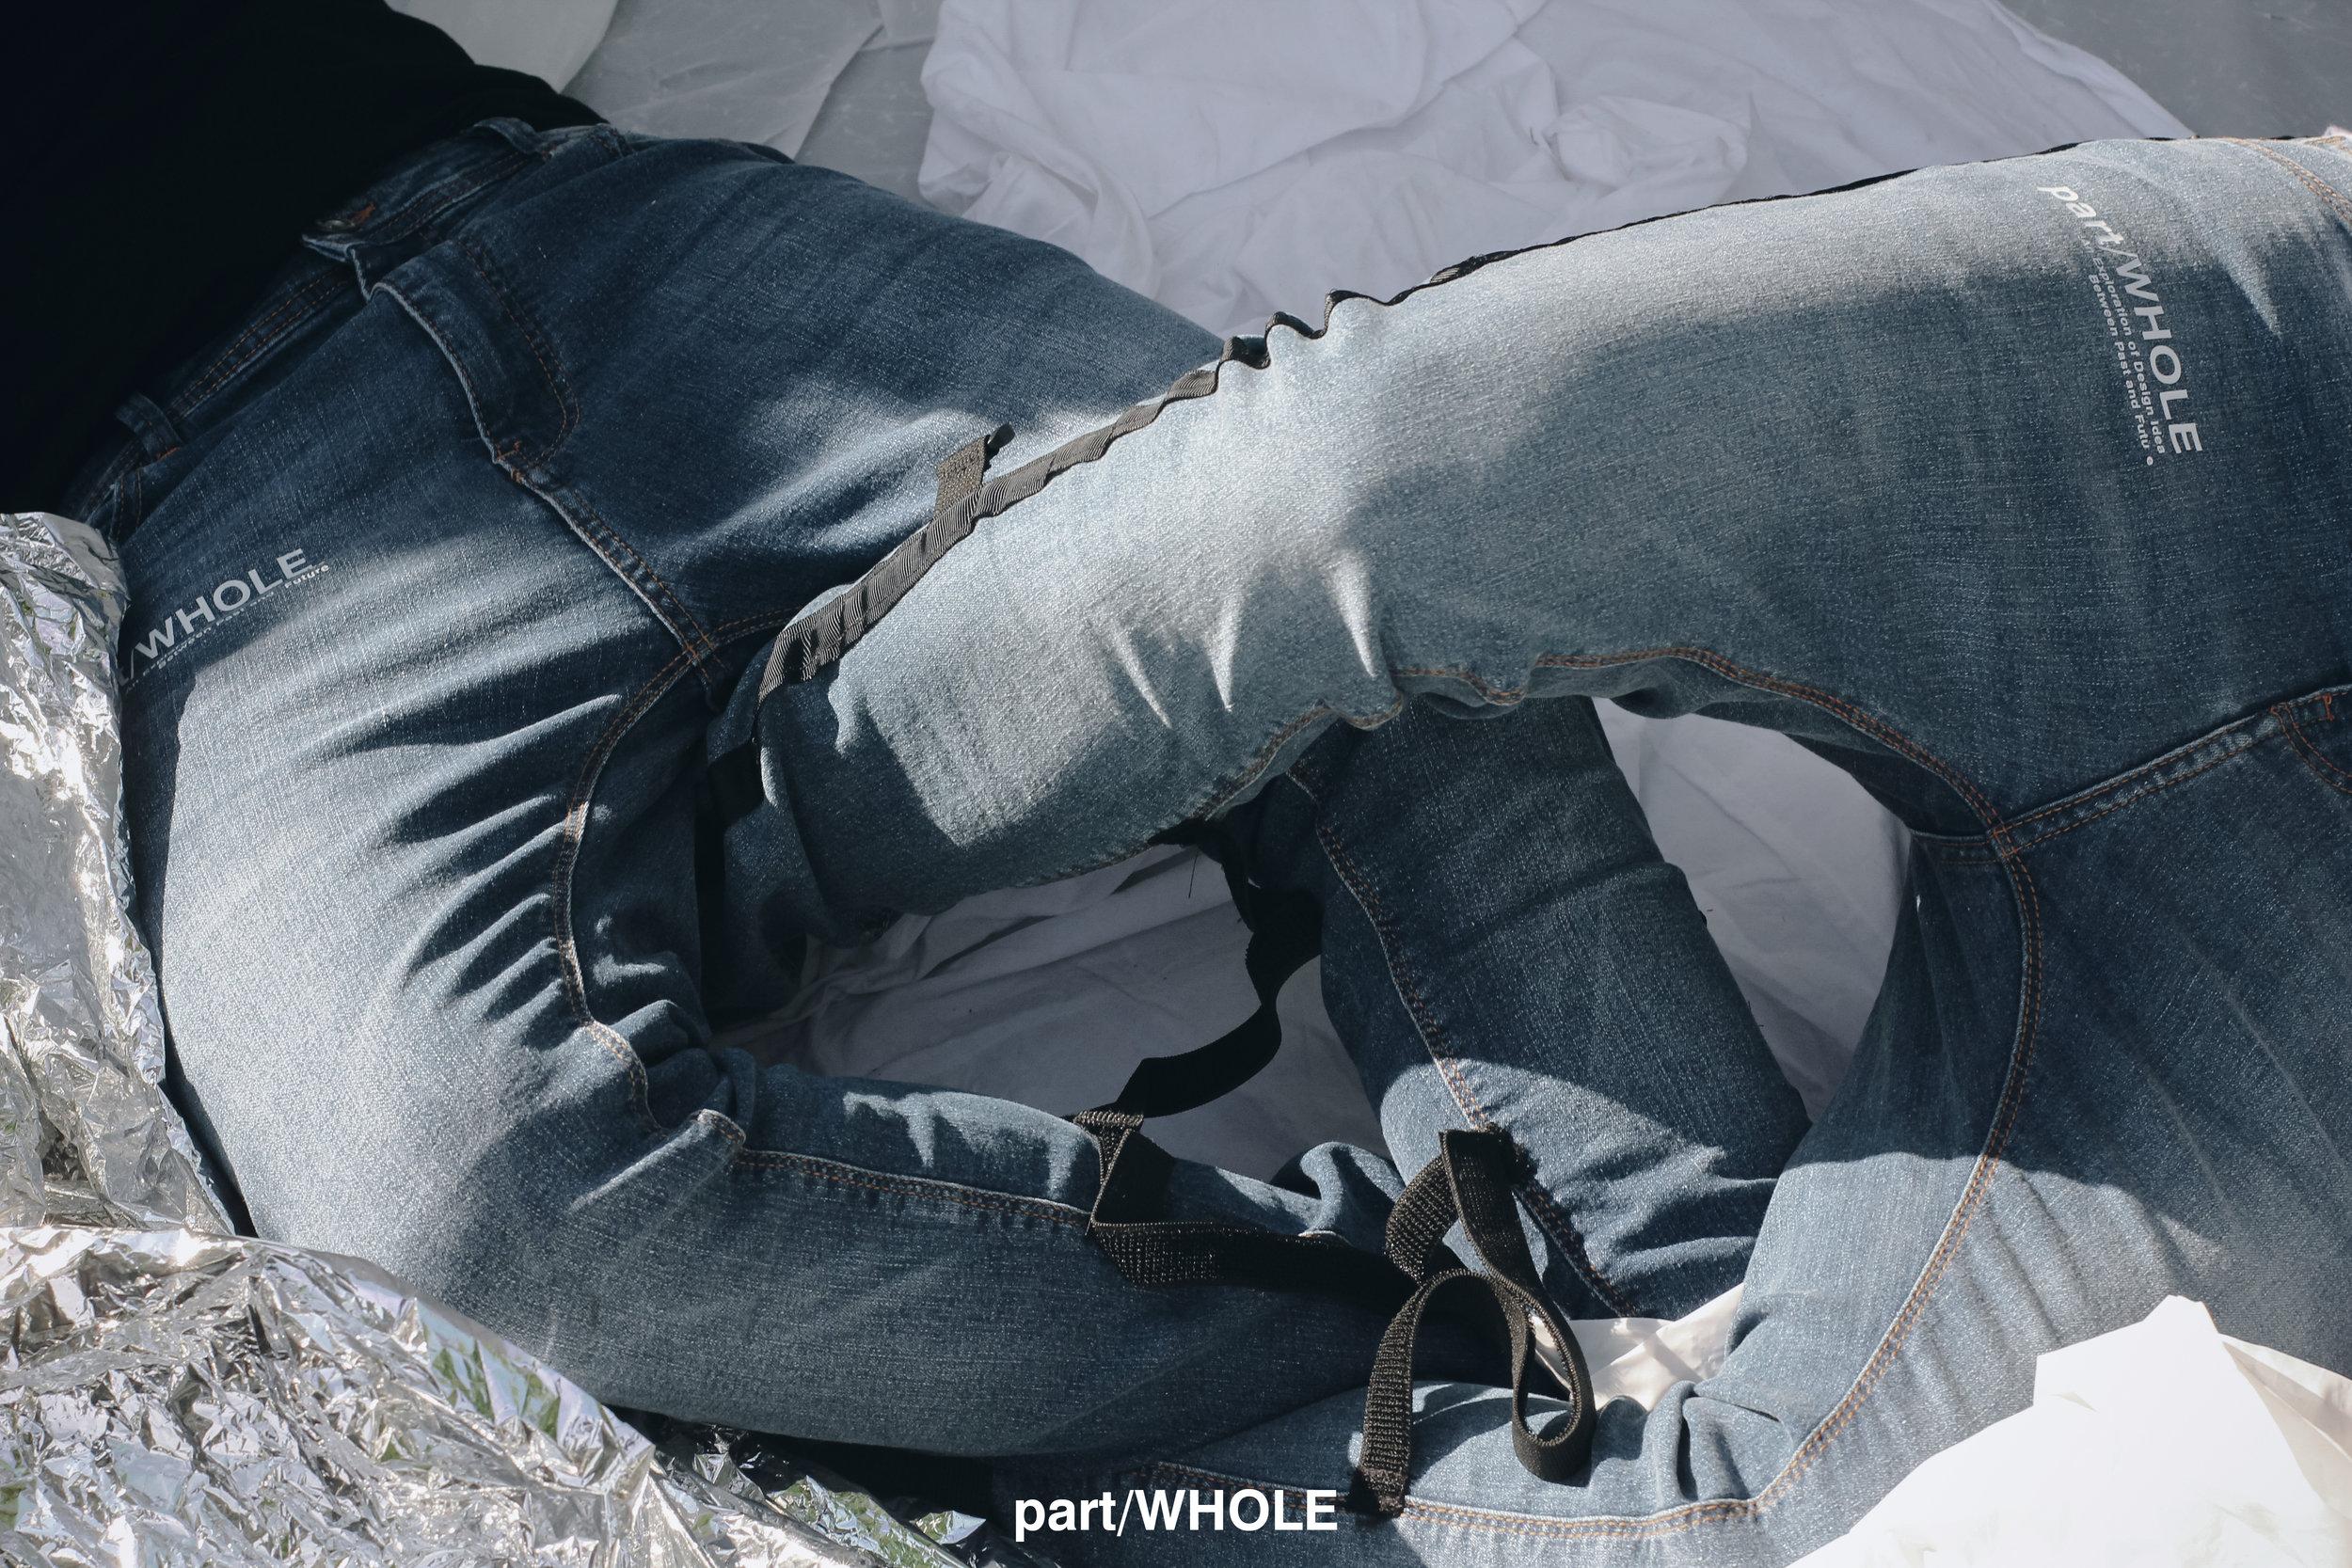 Interlocked Leg poster.jpg